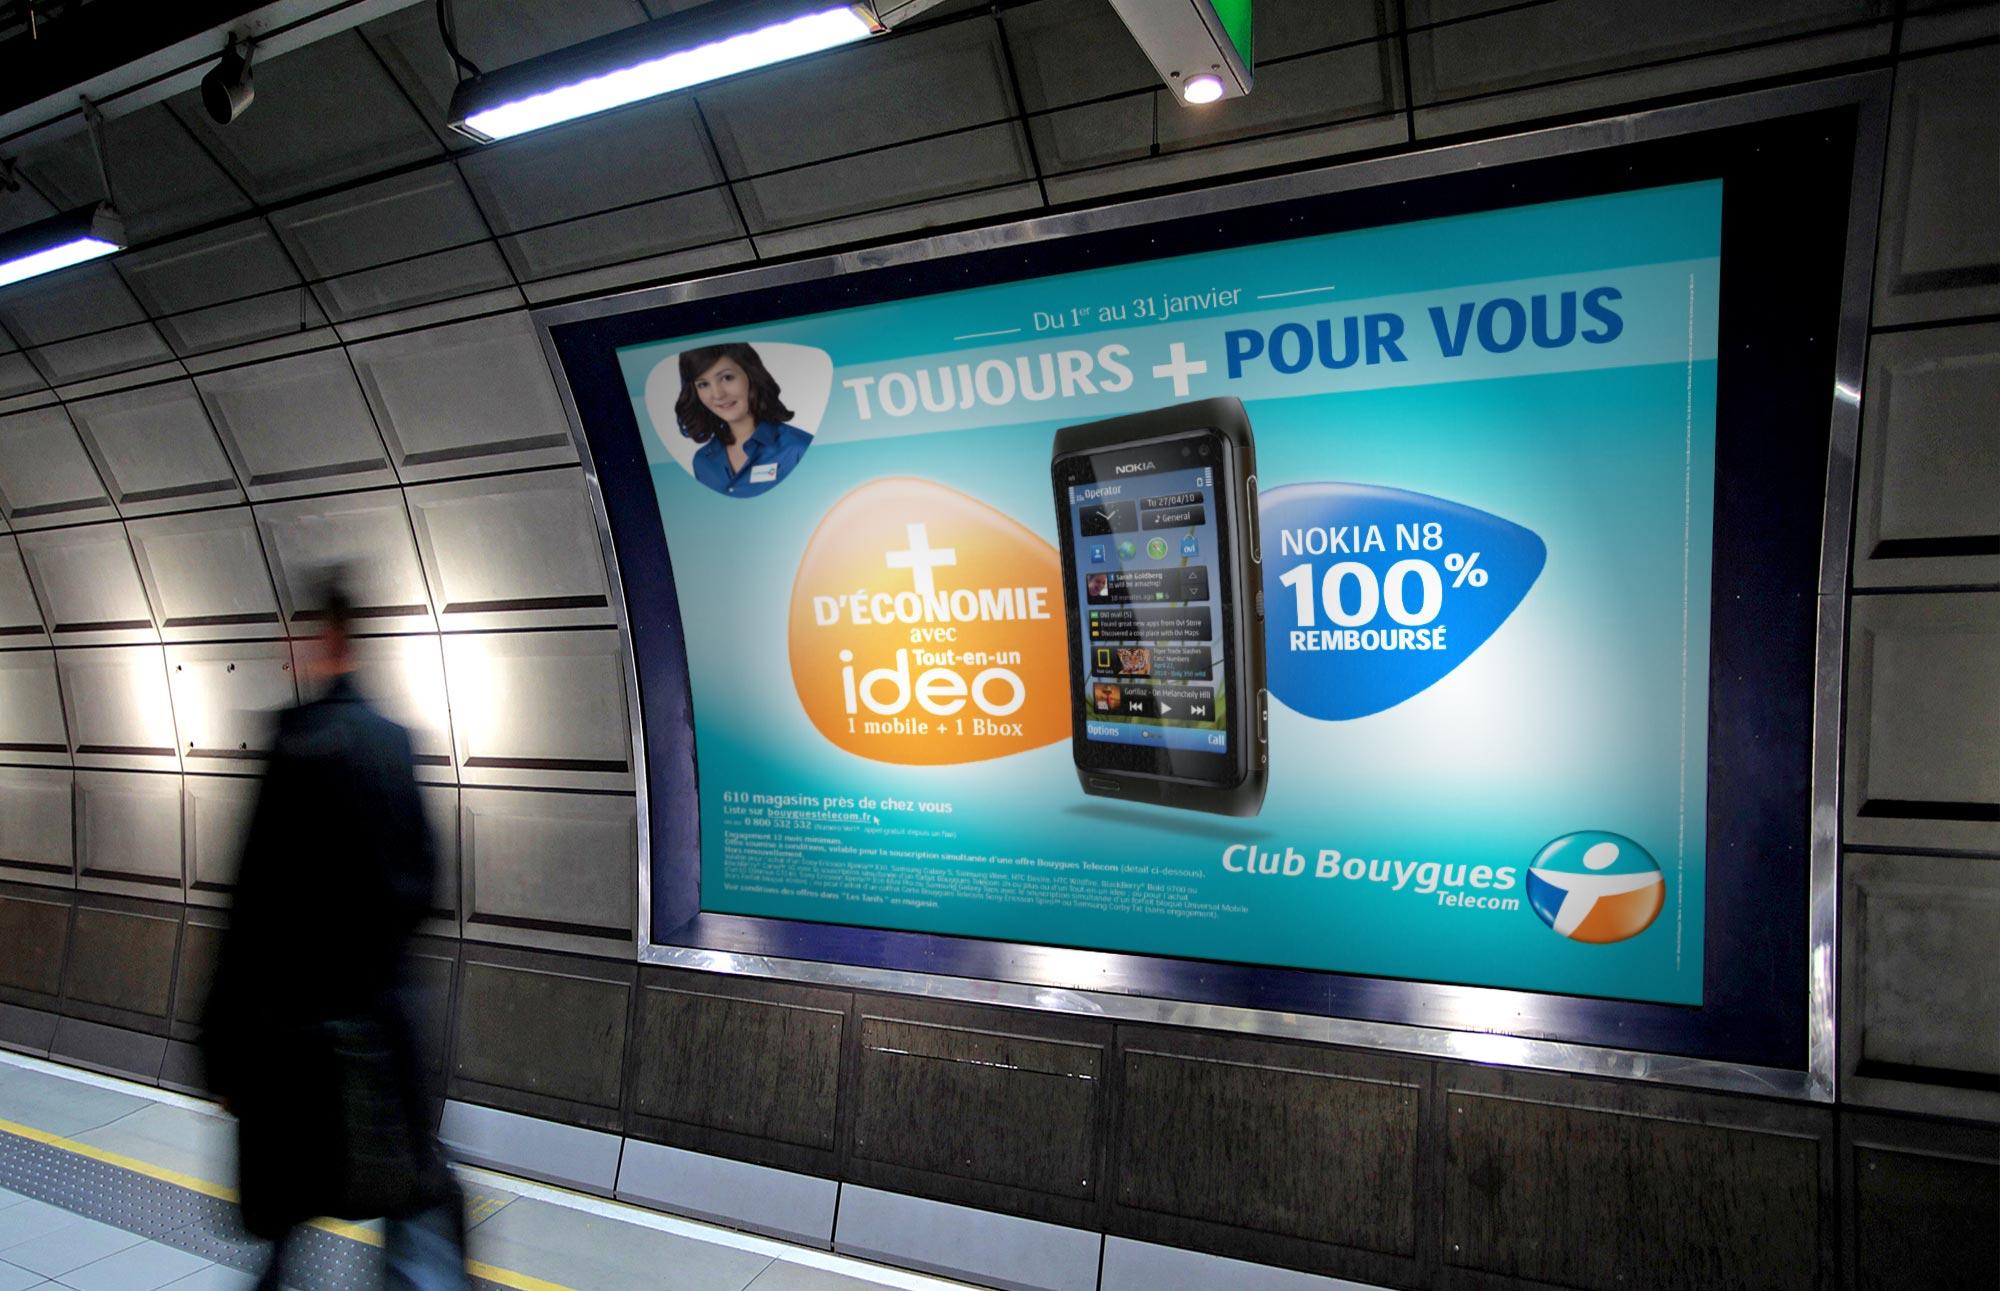 Thibaud-Bouygues-telecom-1